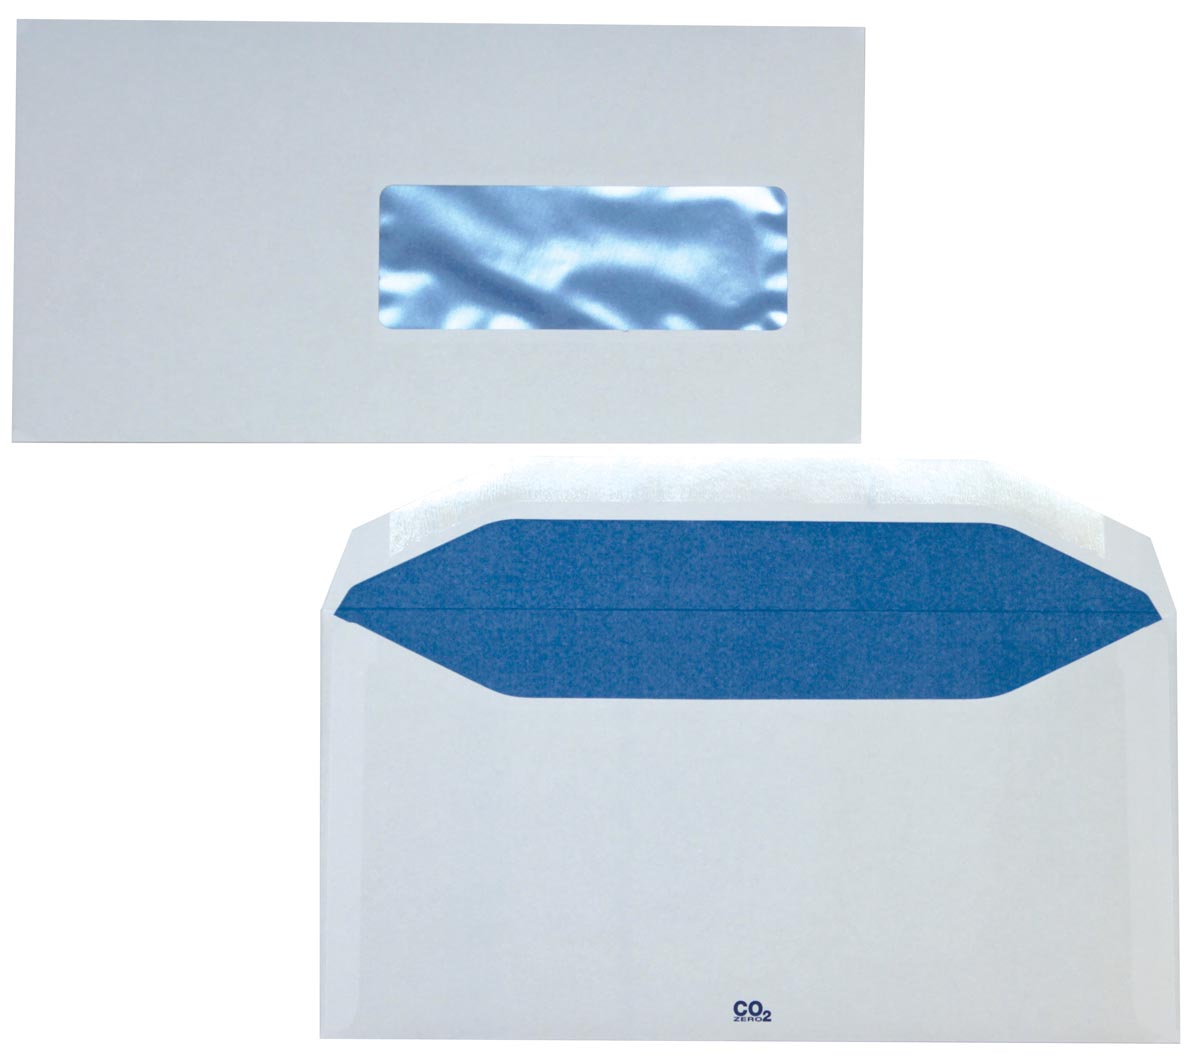 Enveloppen ft 114 x 229 mm gegomd, venster rechts (ft 40 x 110 mm), 500 stuks